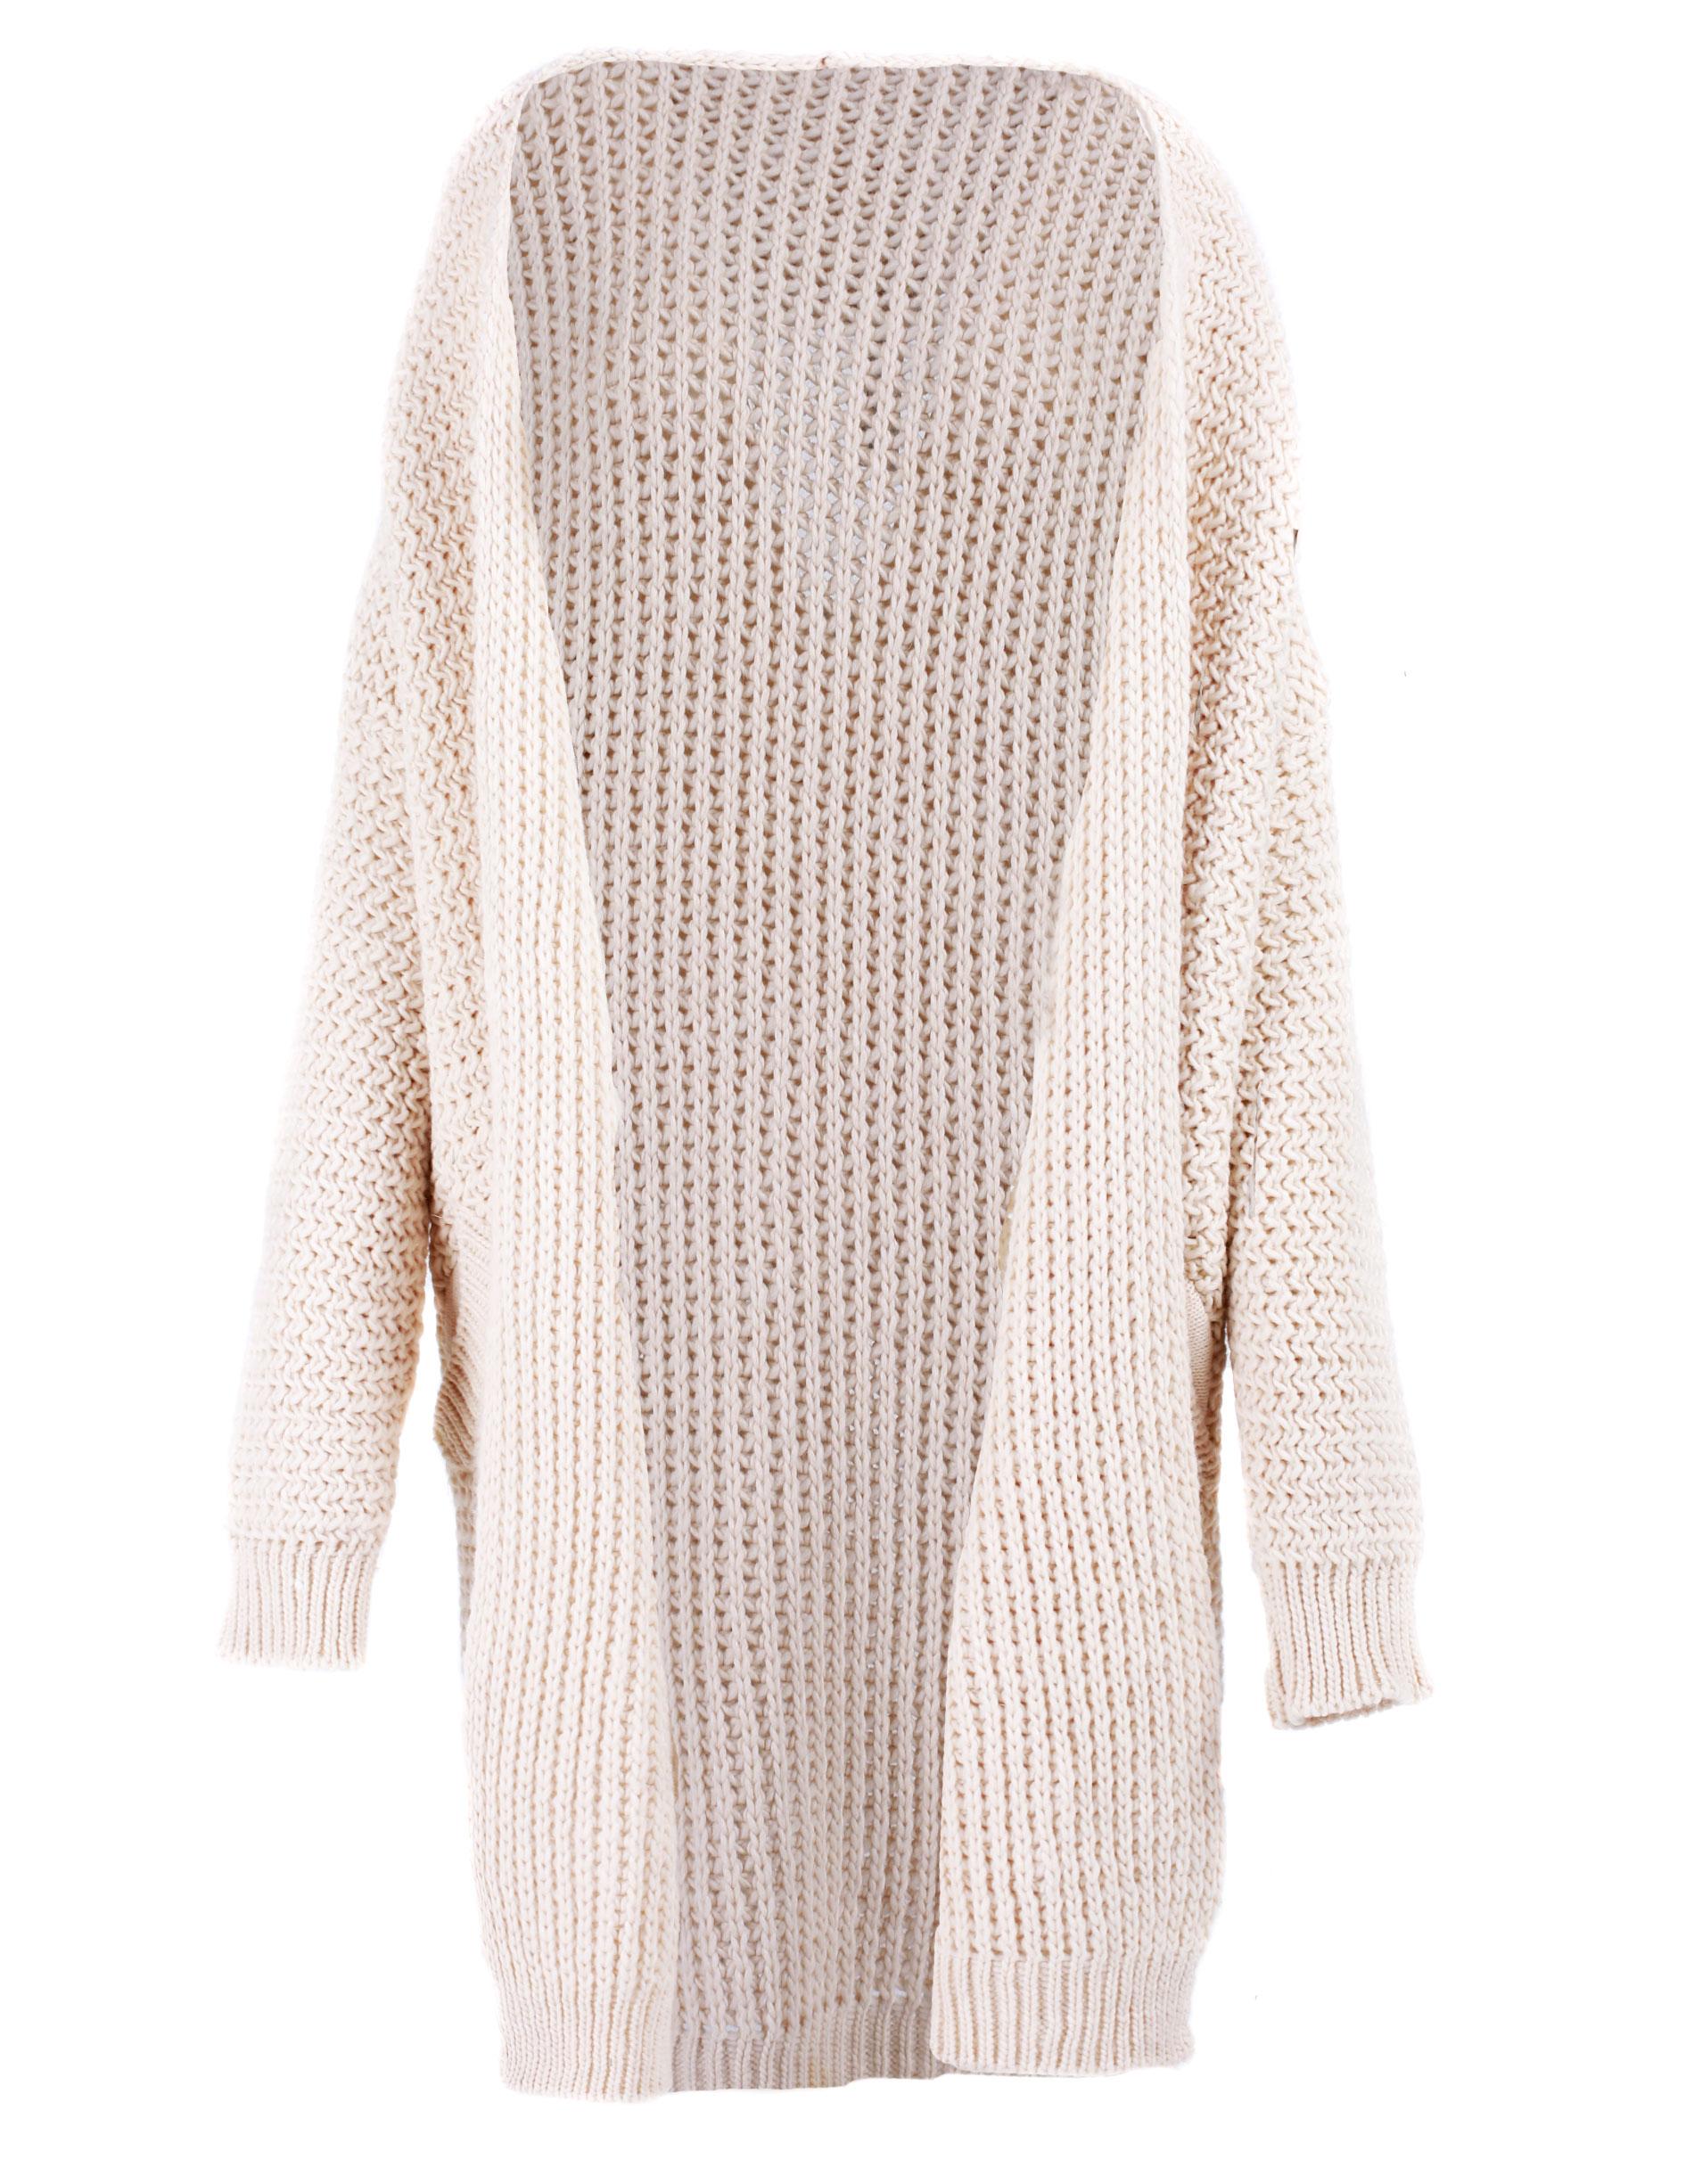 Sweter - 172-3030 BECH - Unisono